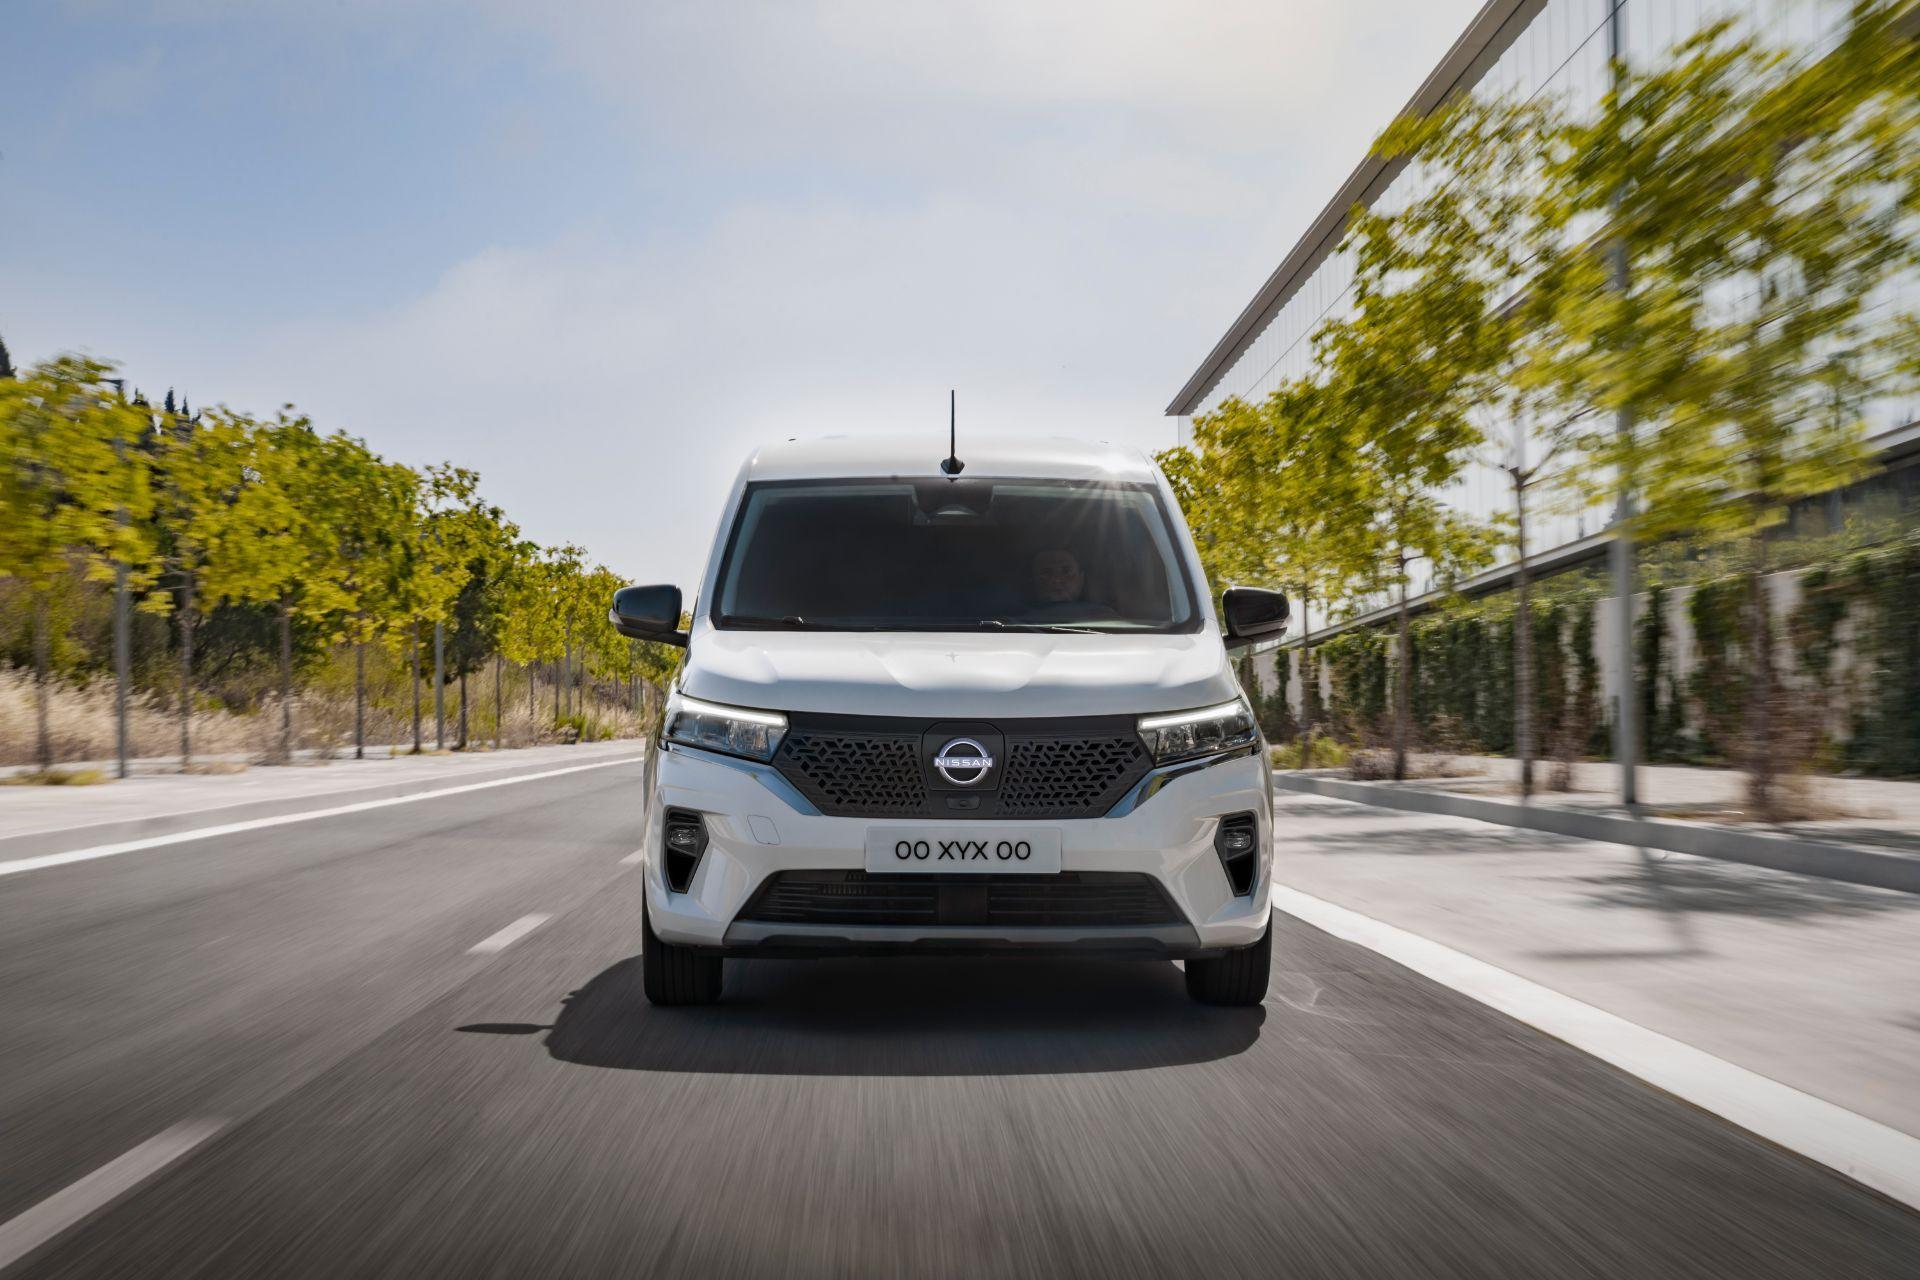 2022-Nissan-Townstar-EV-van-dynamic-1-1